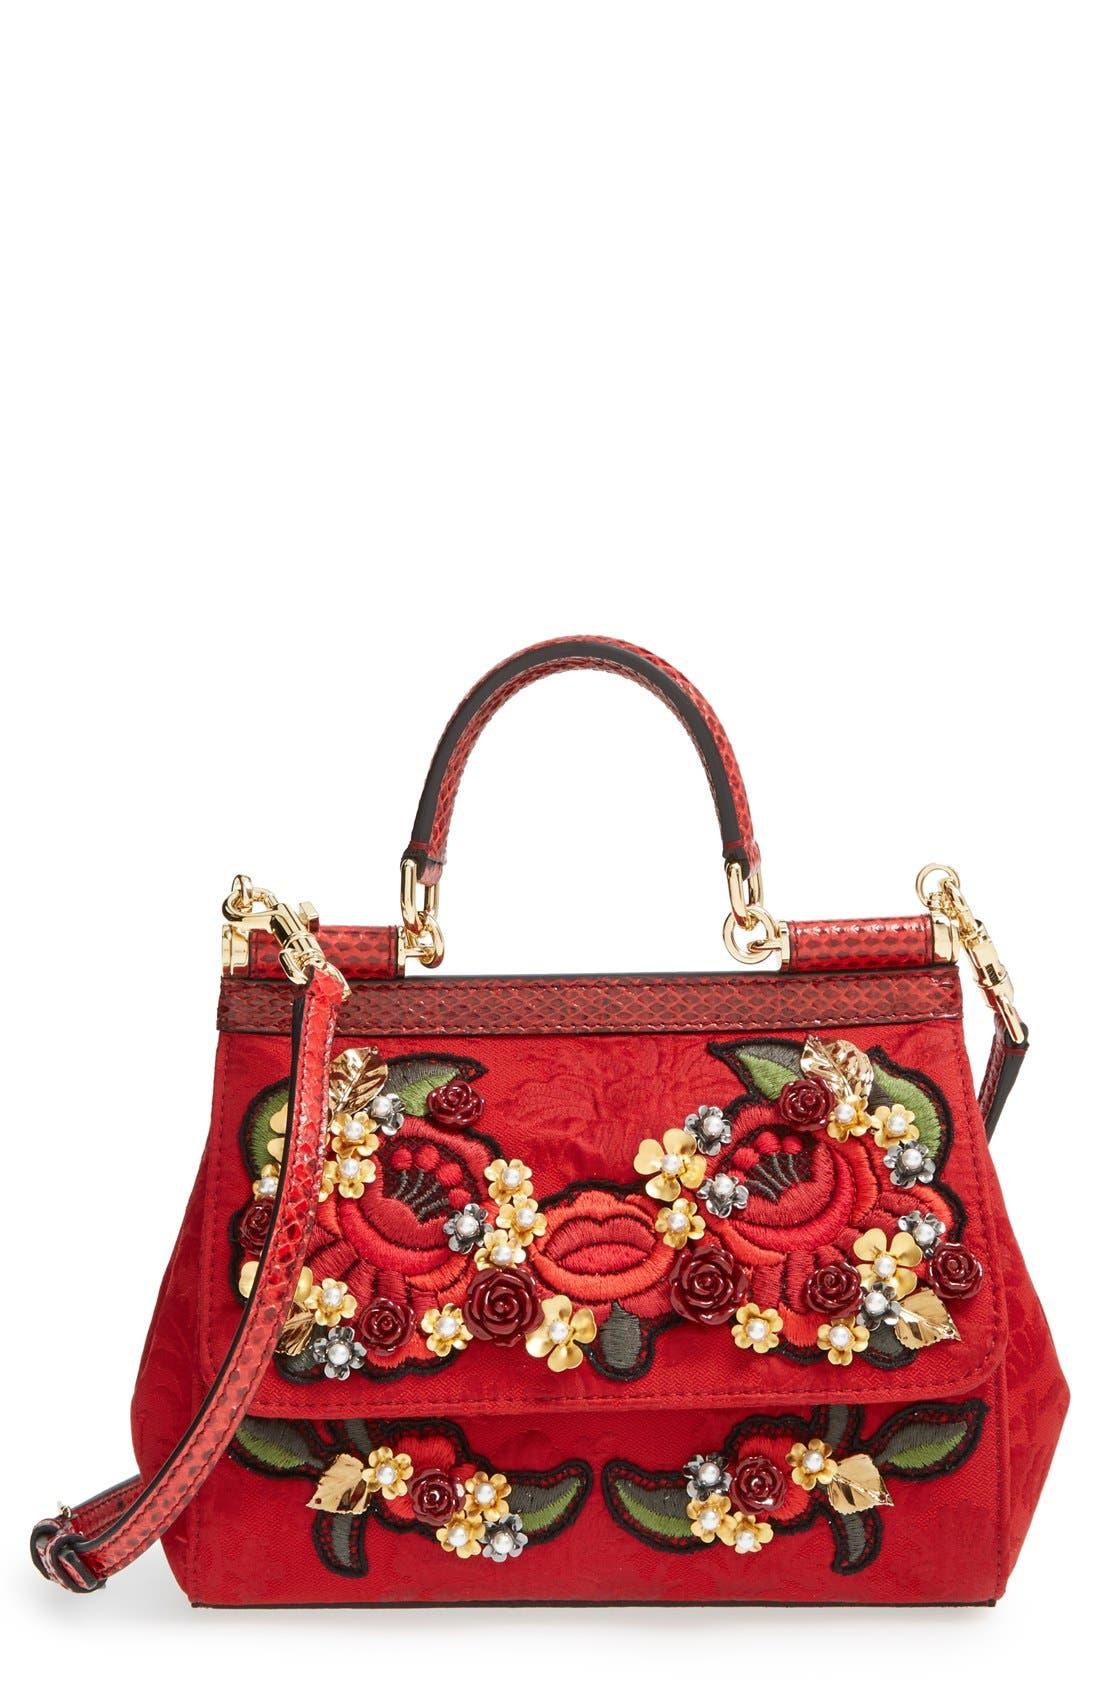 Main Image - Dolce&Gabbana 'Miss Sicily' Floral Brocade Satchel